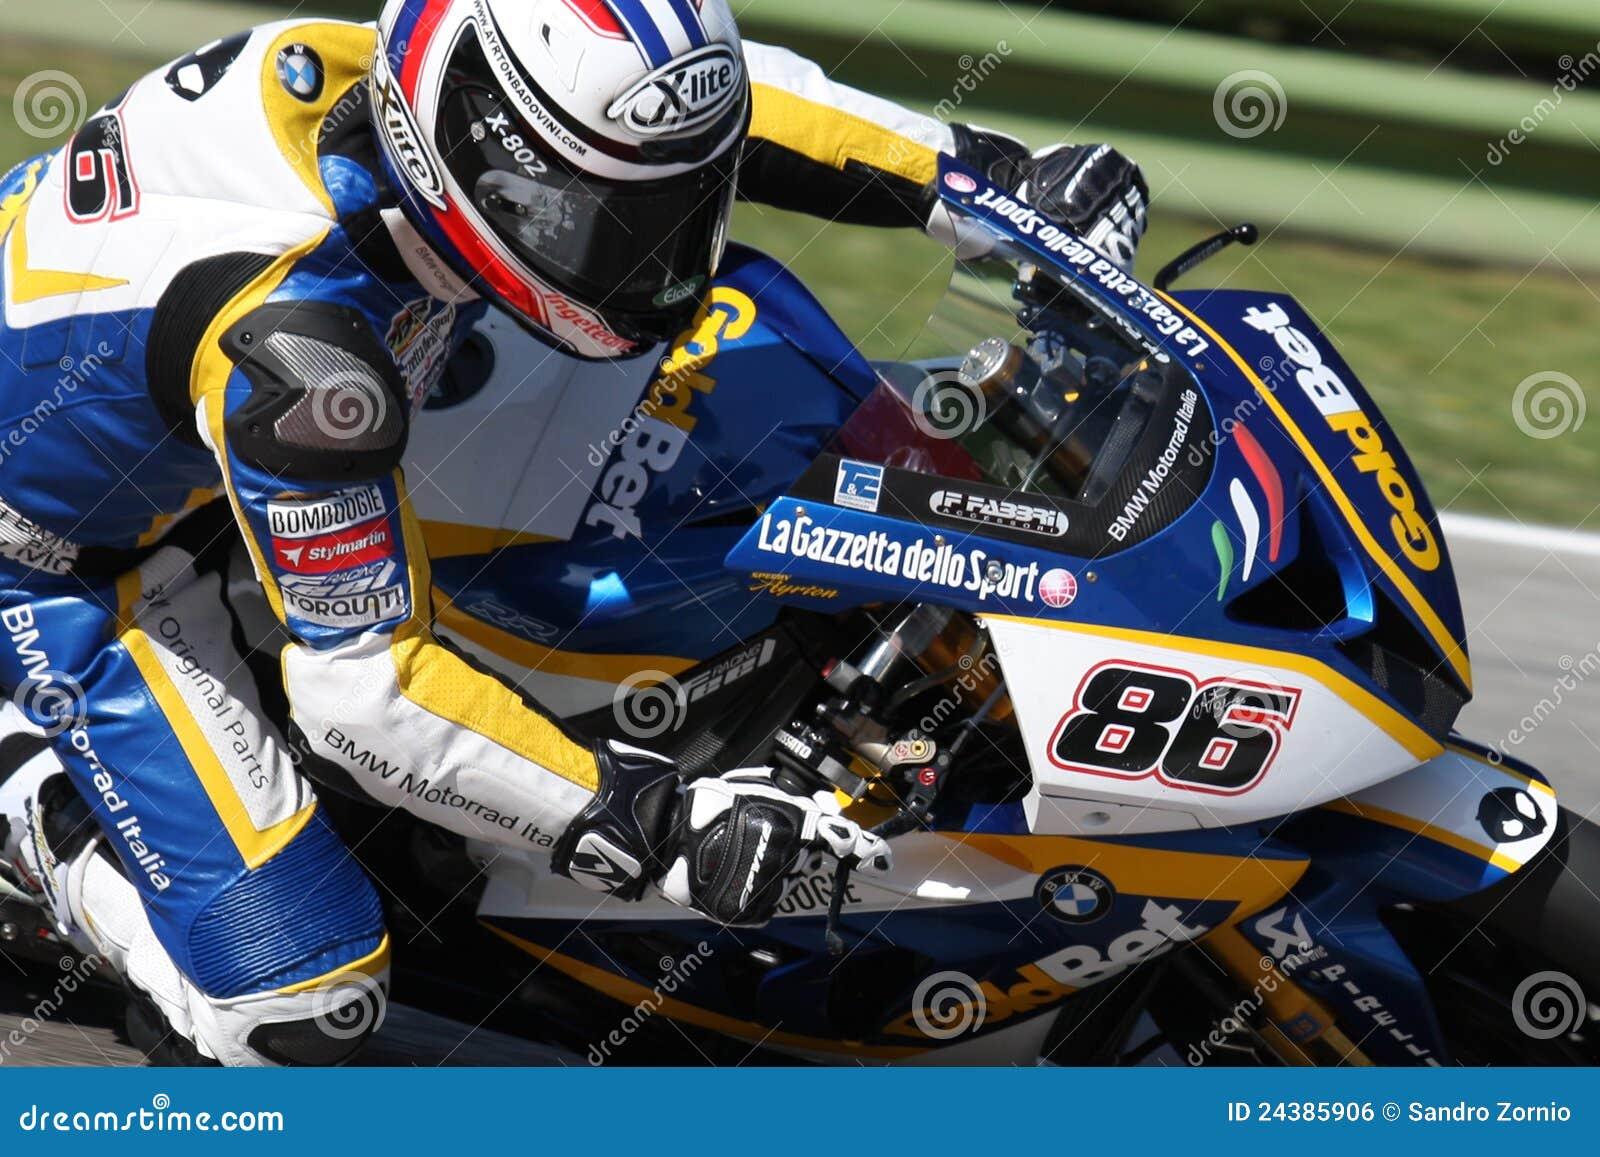 Ayrton Badovini BMW S1000 RR - BMW Motorsport